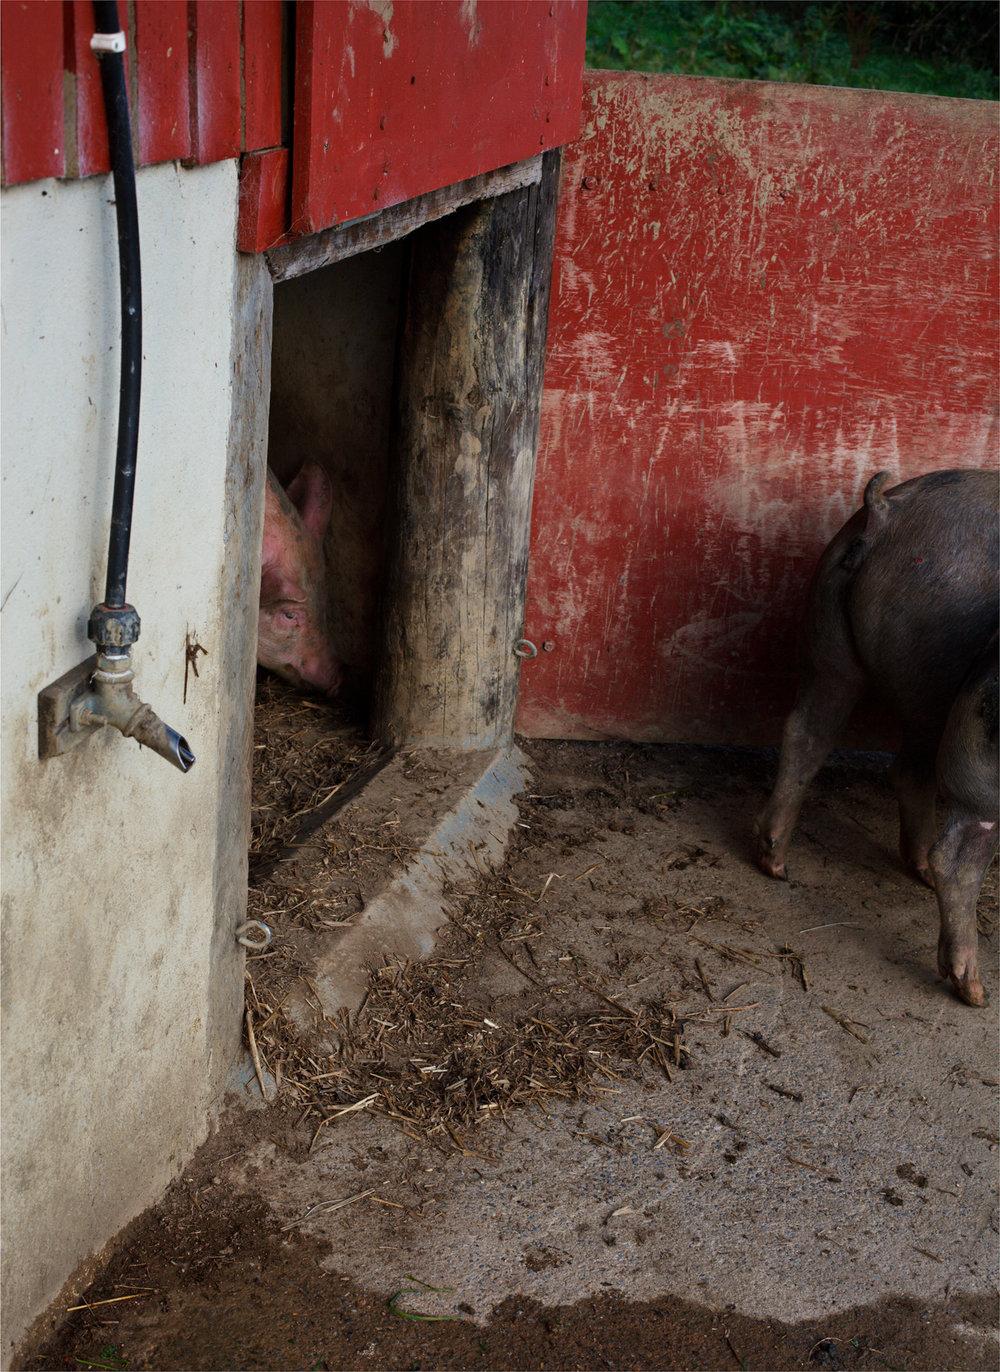 Pig, tail